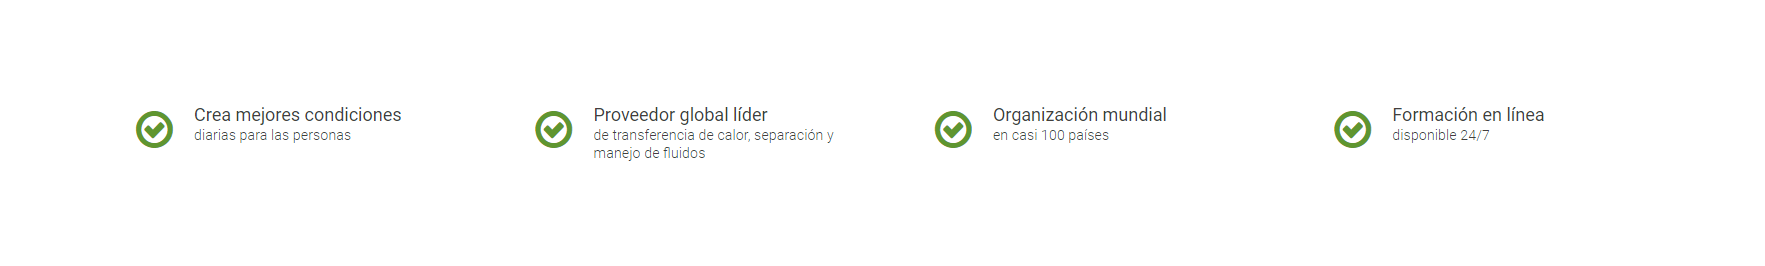 beneficios-calculo-intercambiador-calor.png